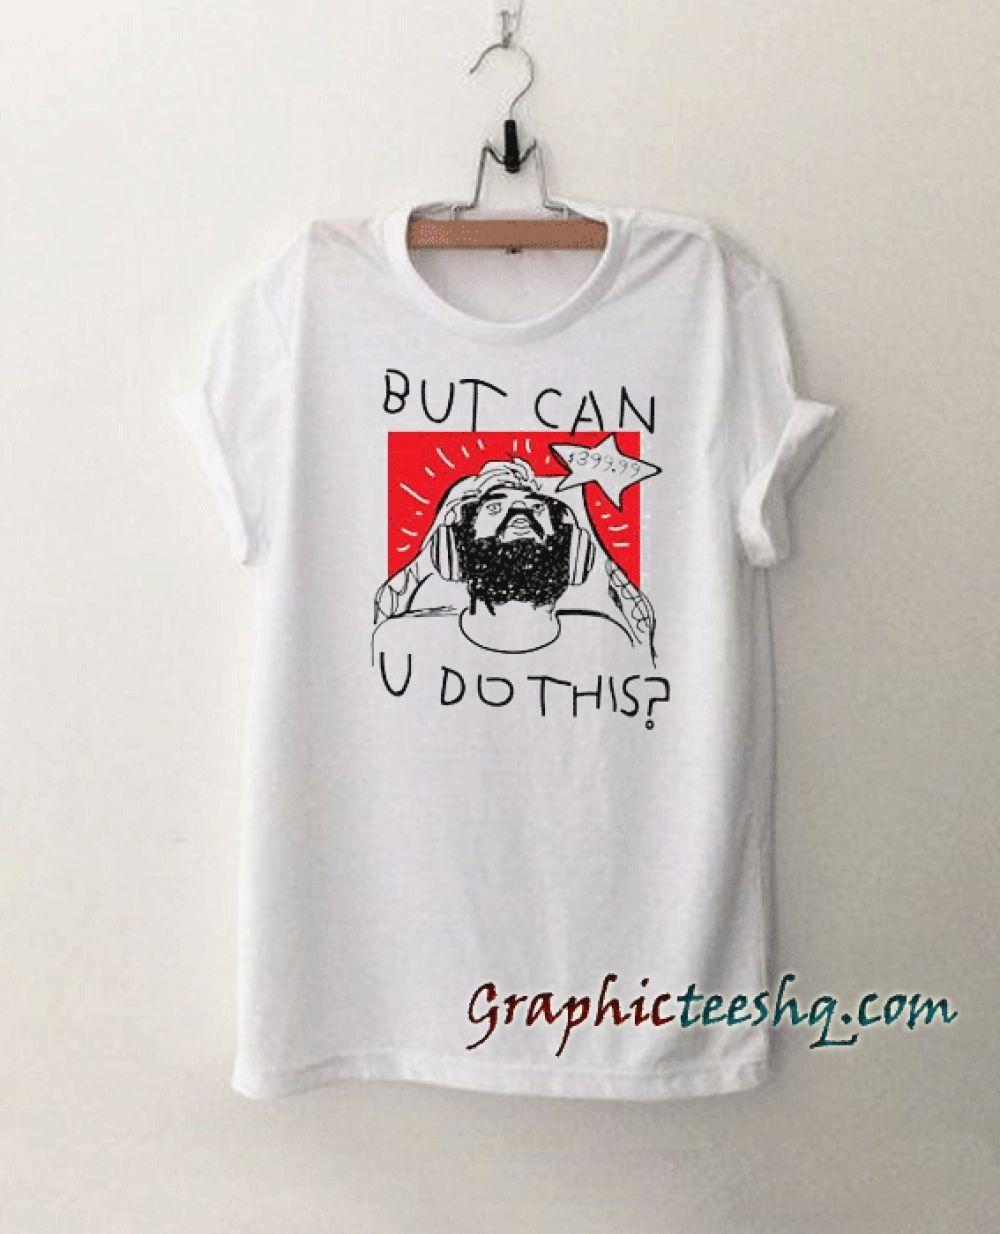 cf8110f82f5b Pewdiepie But Can You Do This Tee Shirt Price  13.50  style  fashion   tshirts  tee  tshirtdesign instafashion  black  cute  art  amazing funny   webstagram ...